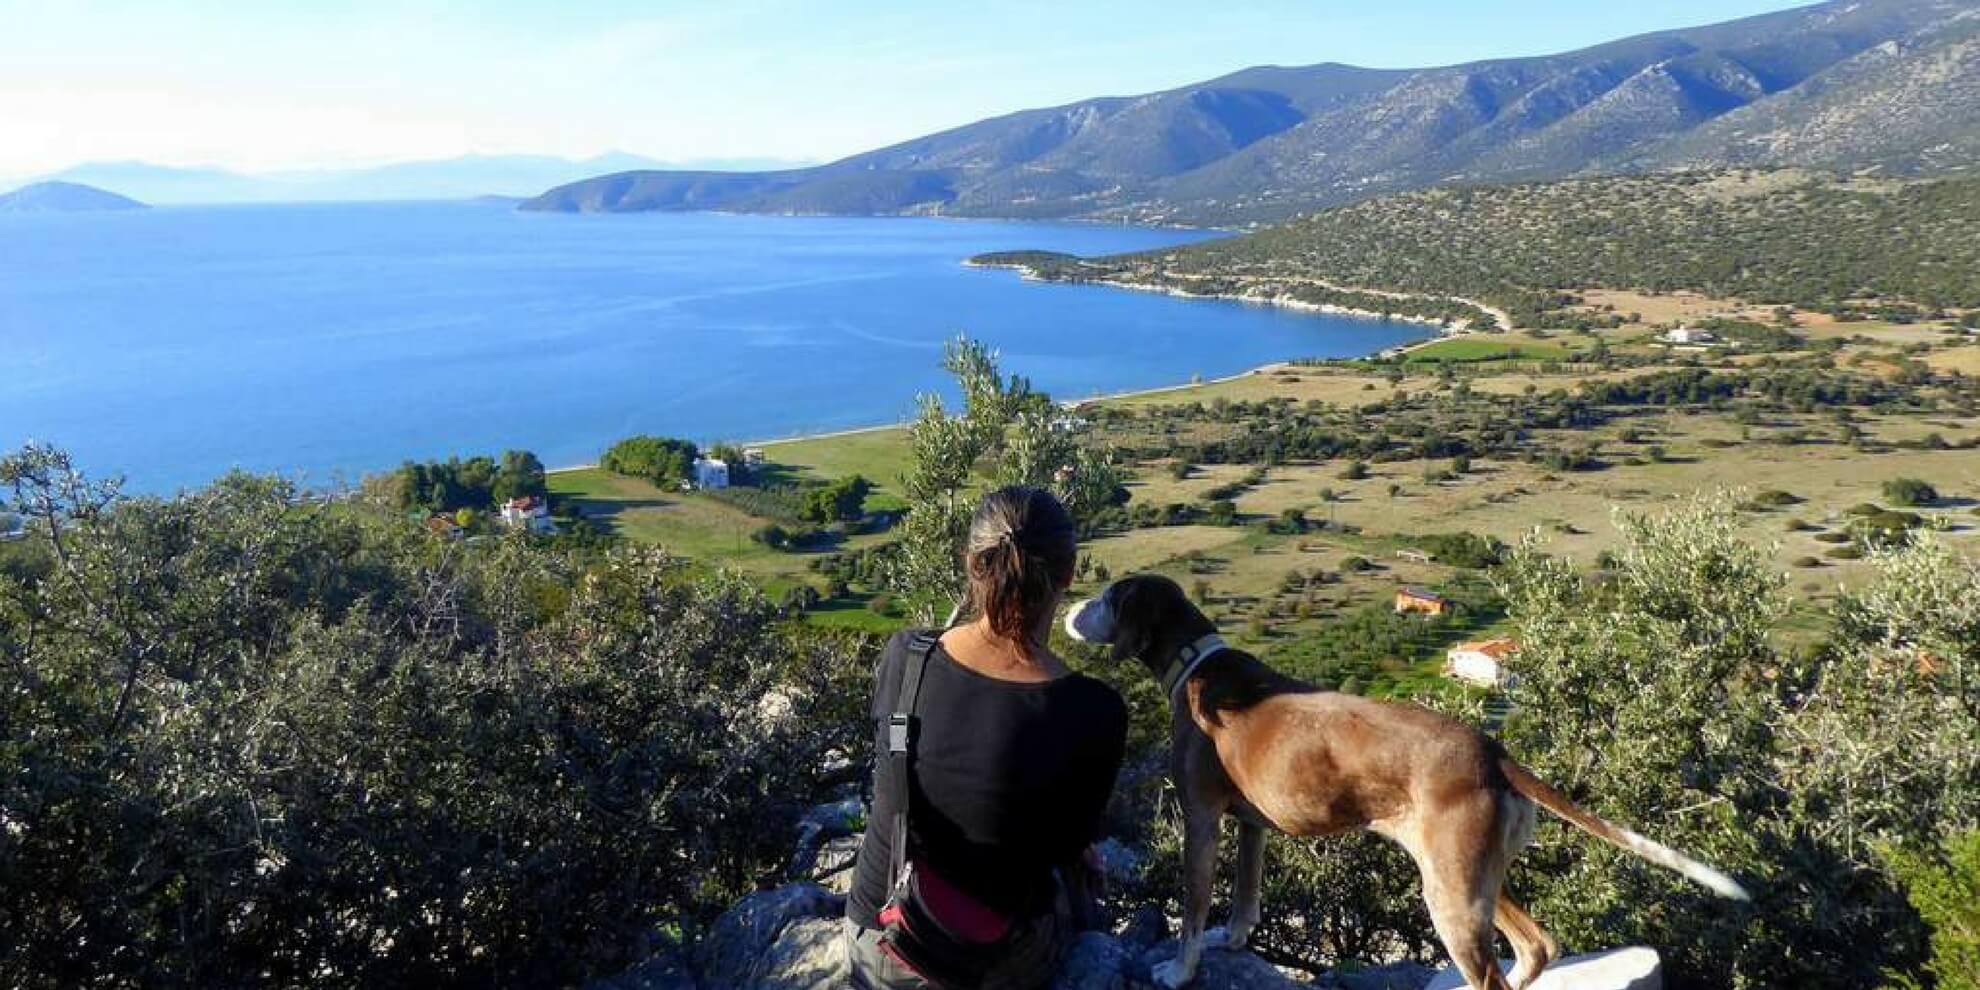 Peloponnes Video: Von Leonidio nach Kranidi